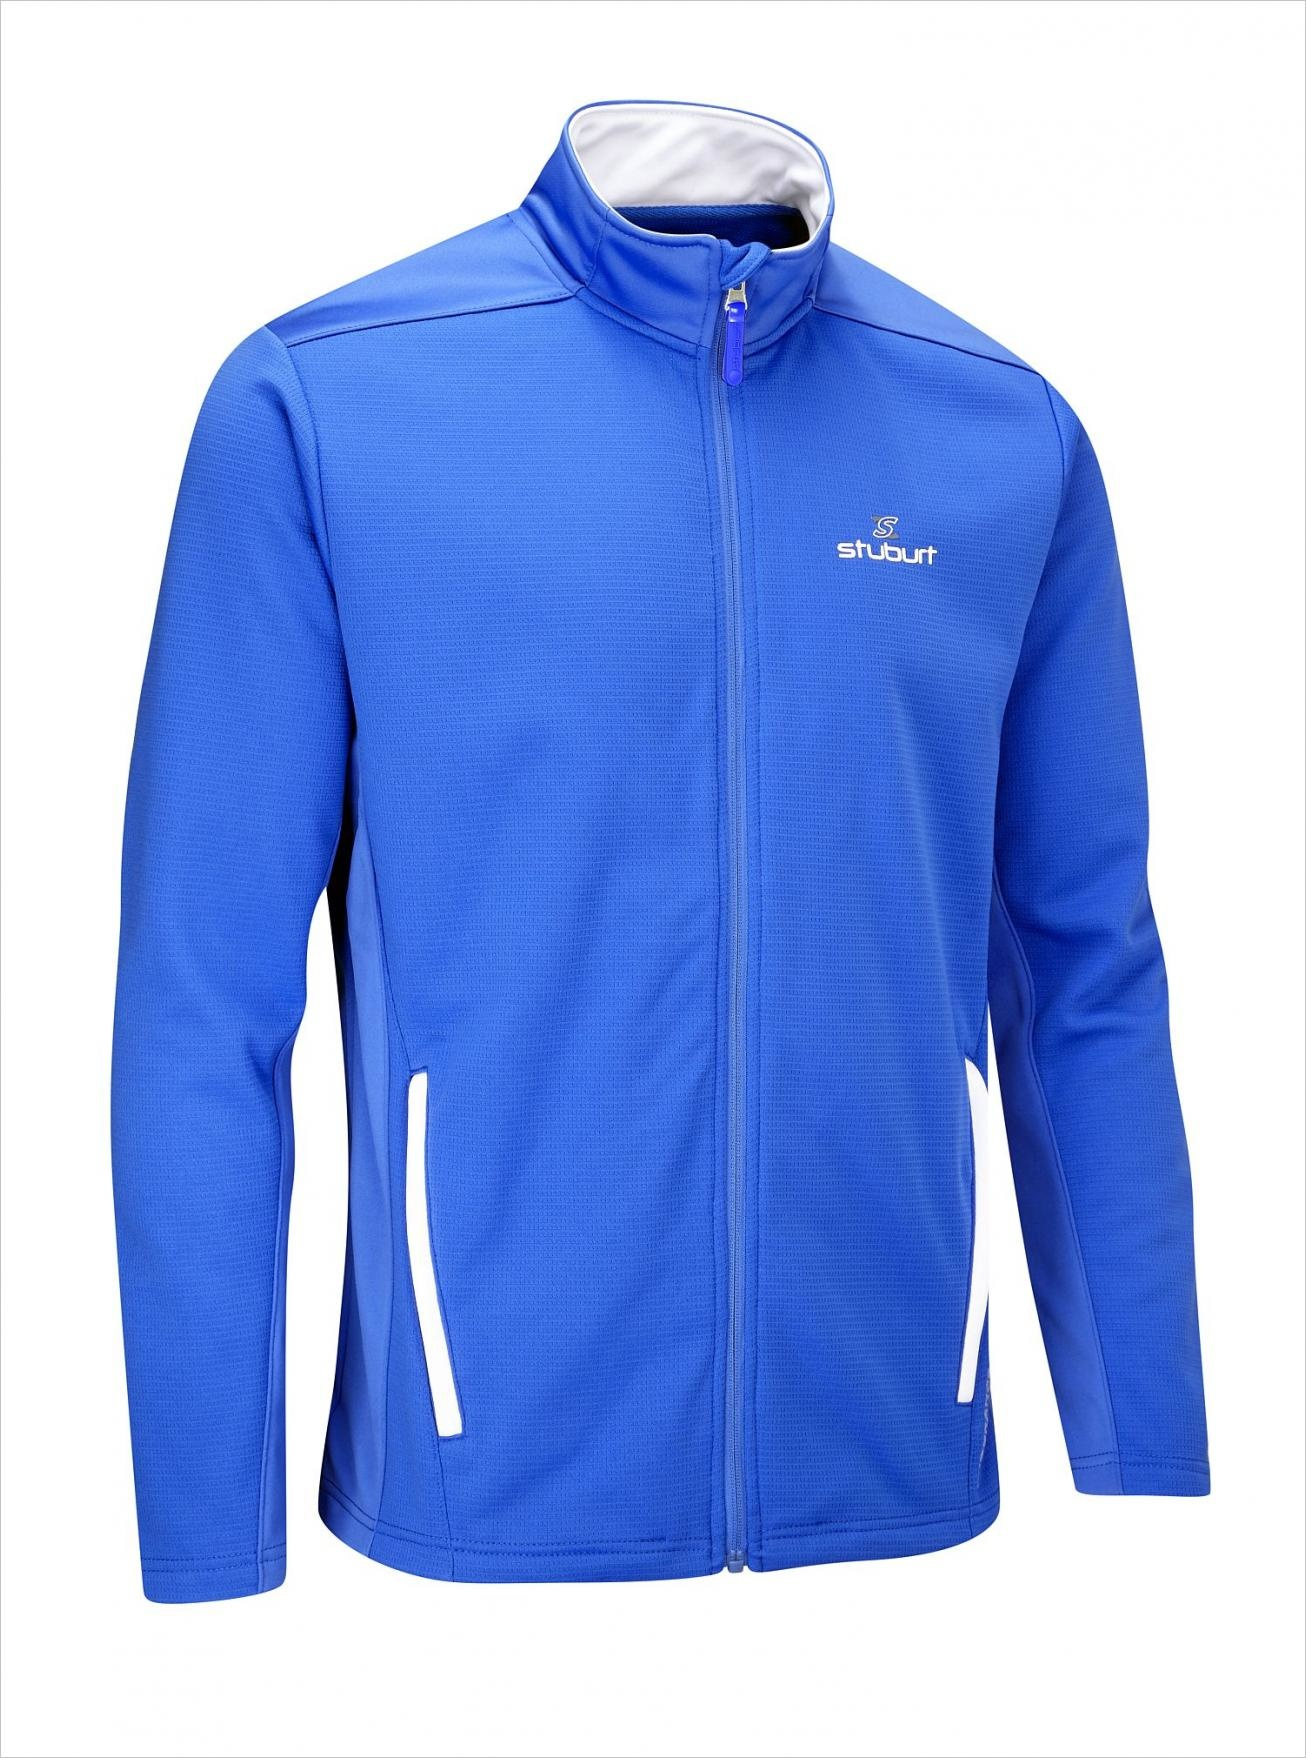 Stuburt Endurance Full Zip Fleece Trui - Imperial Blue